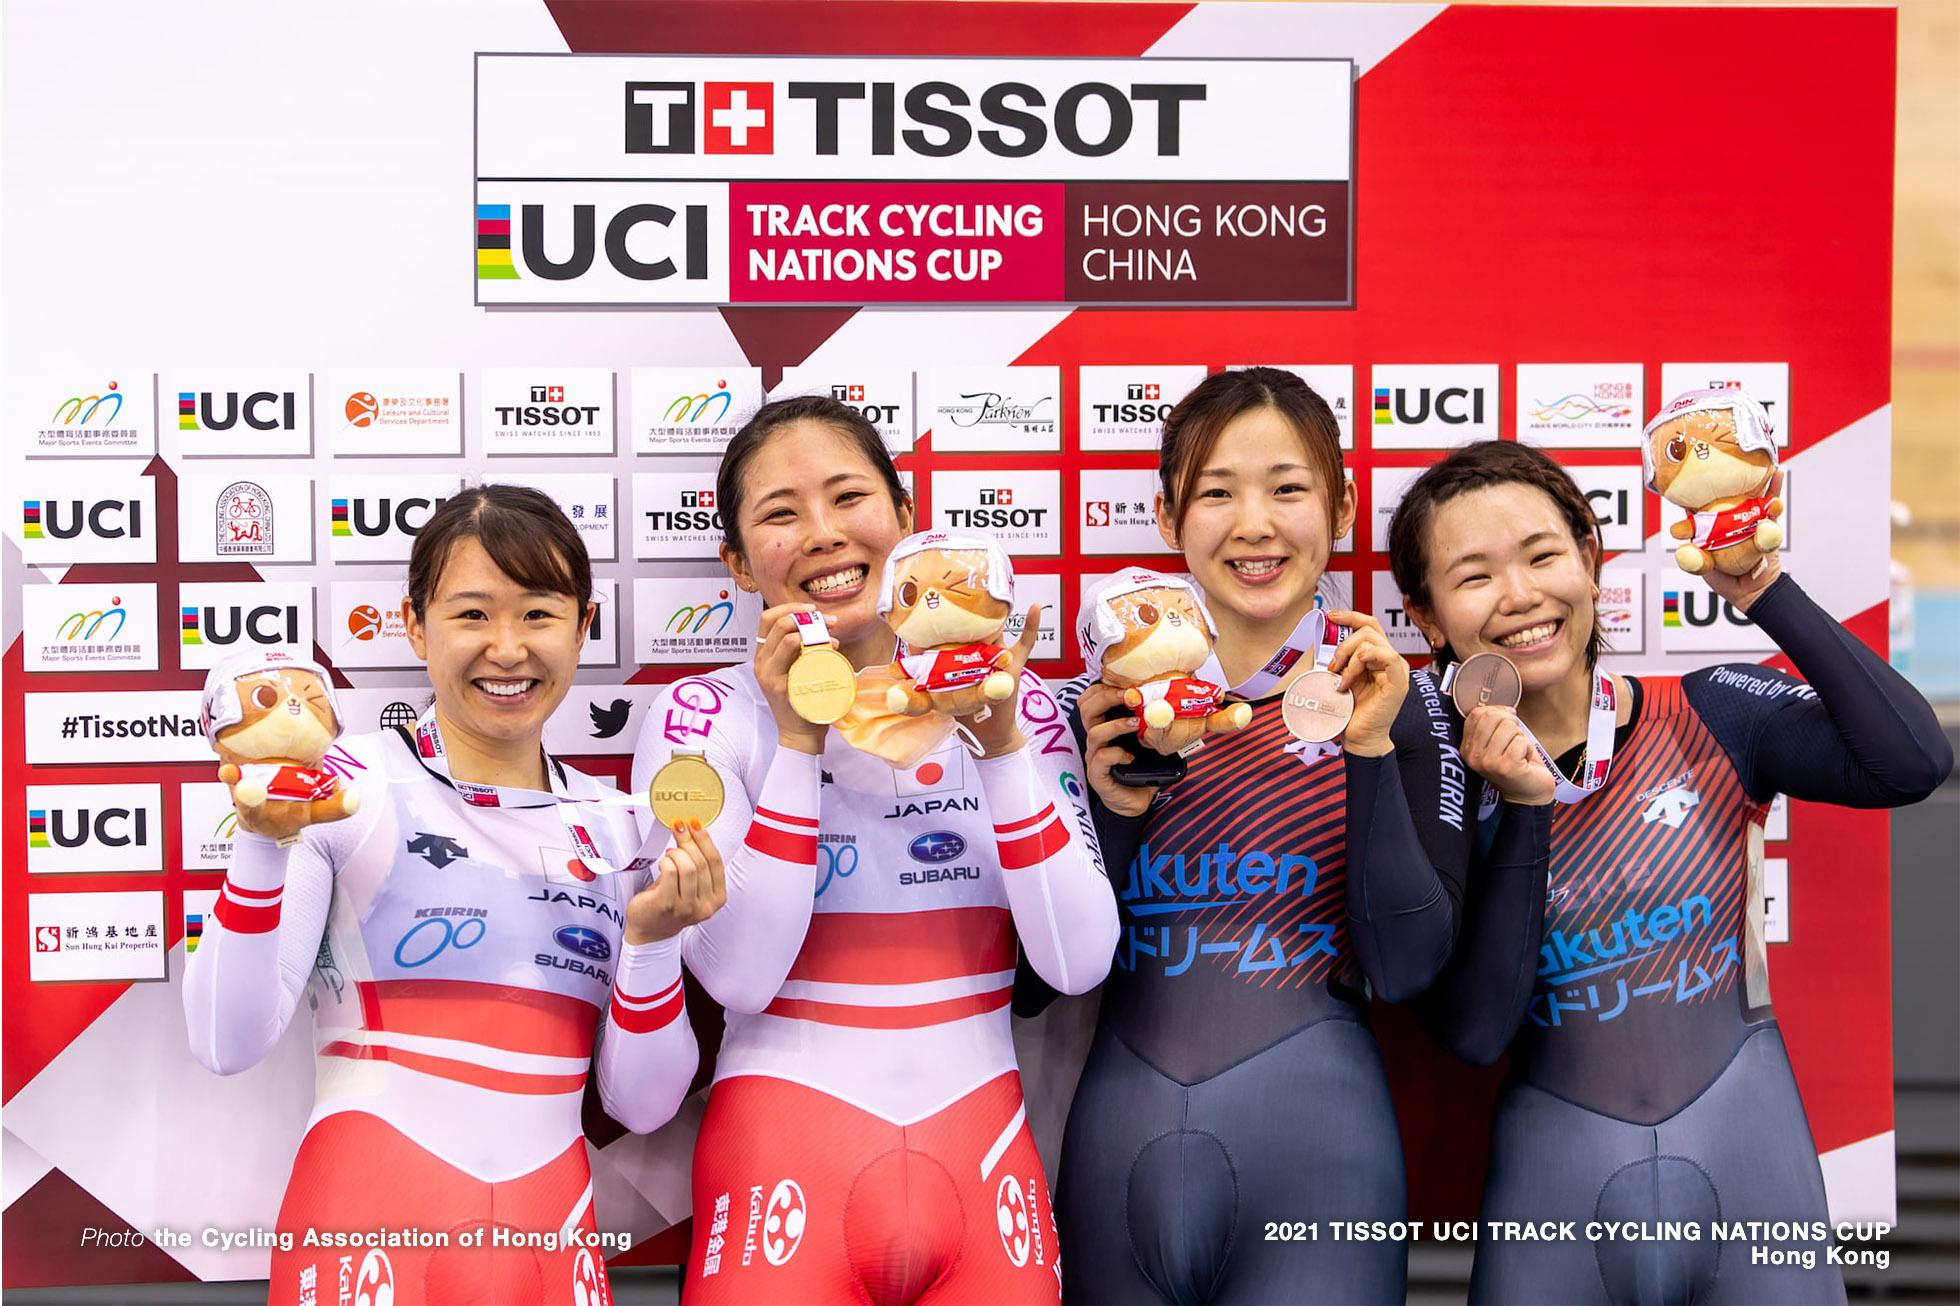 Womens Madison, TISSOT UCI TRACK CYCLING NATIONS CUP - HONG KONG